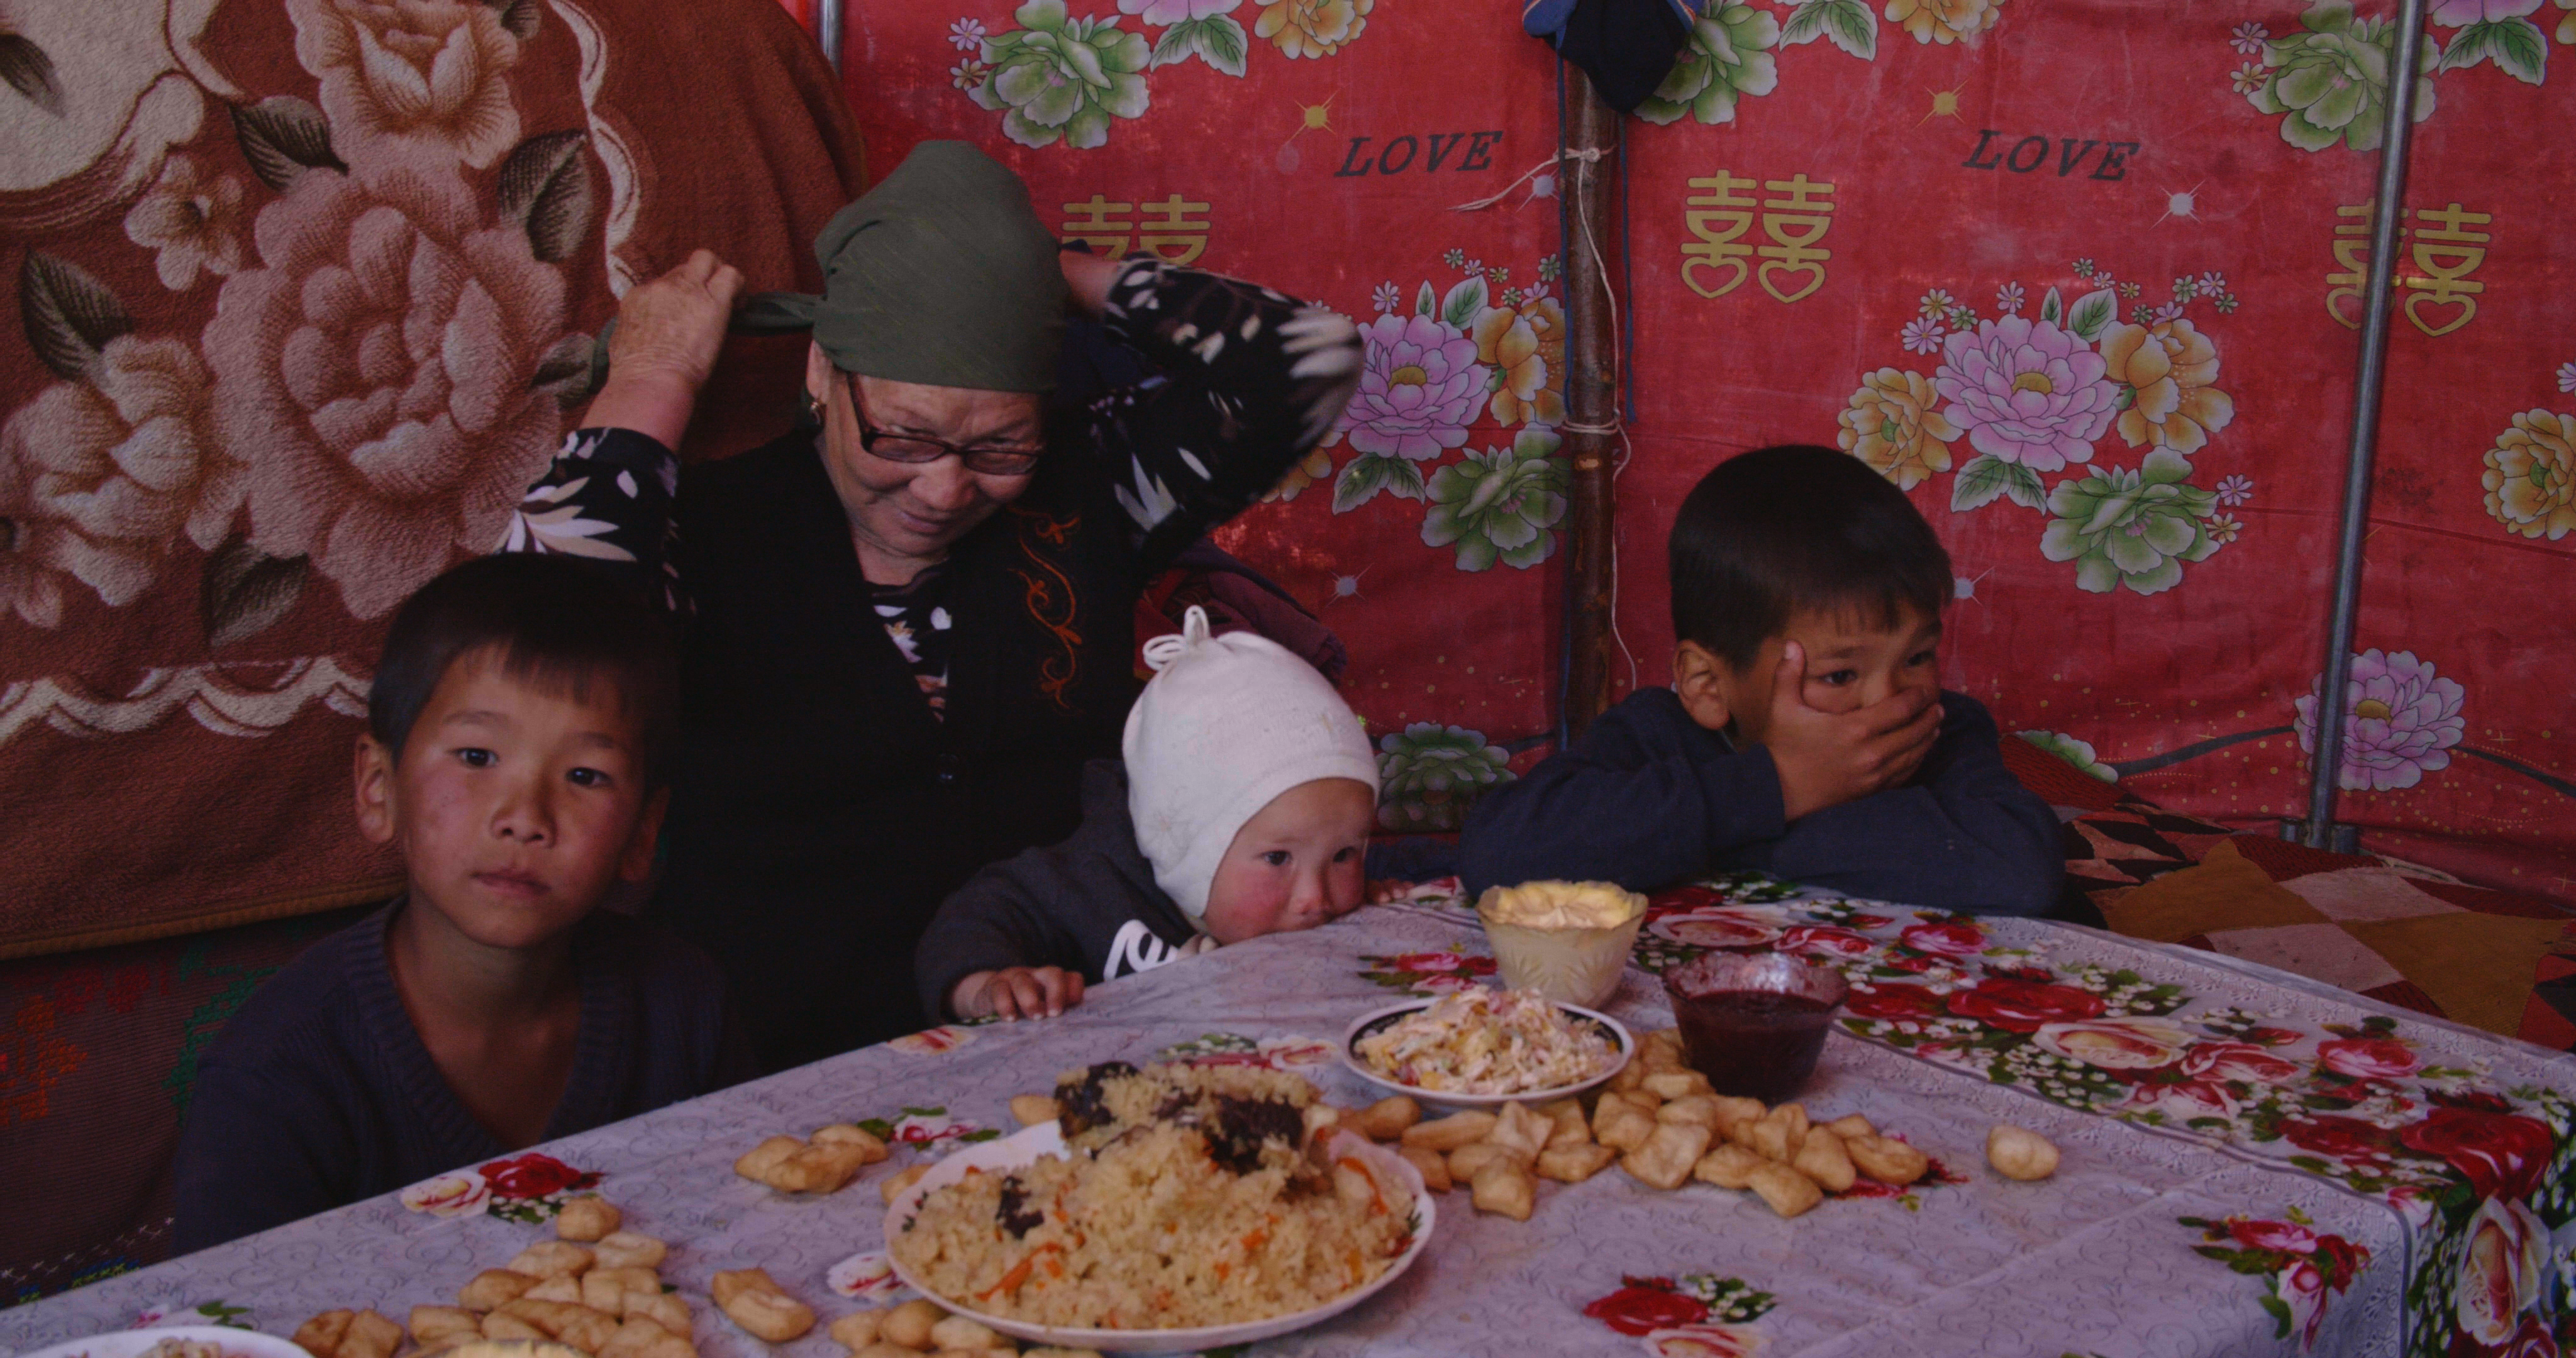 TheBoyFromKyrgyzstan_Stills_1.25.1